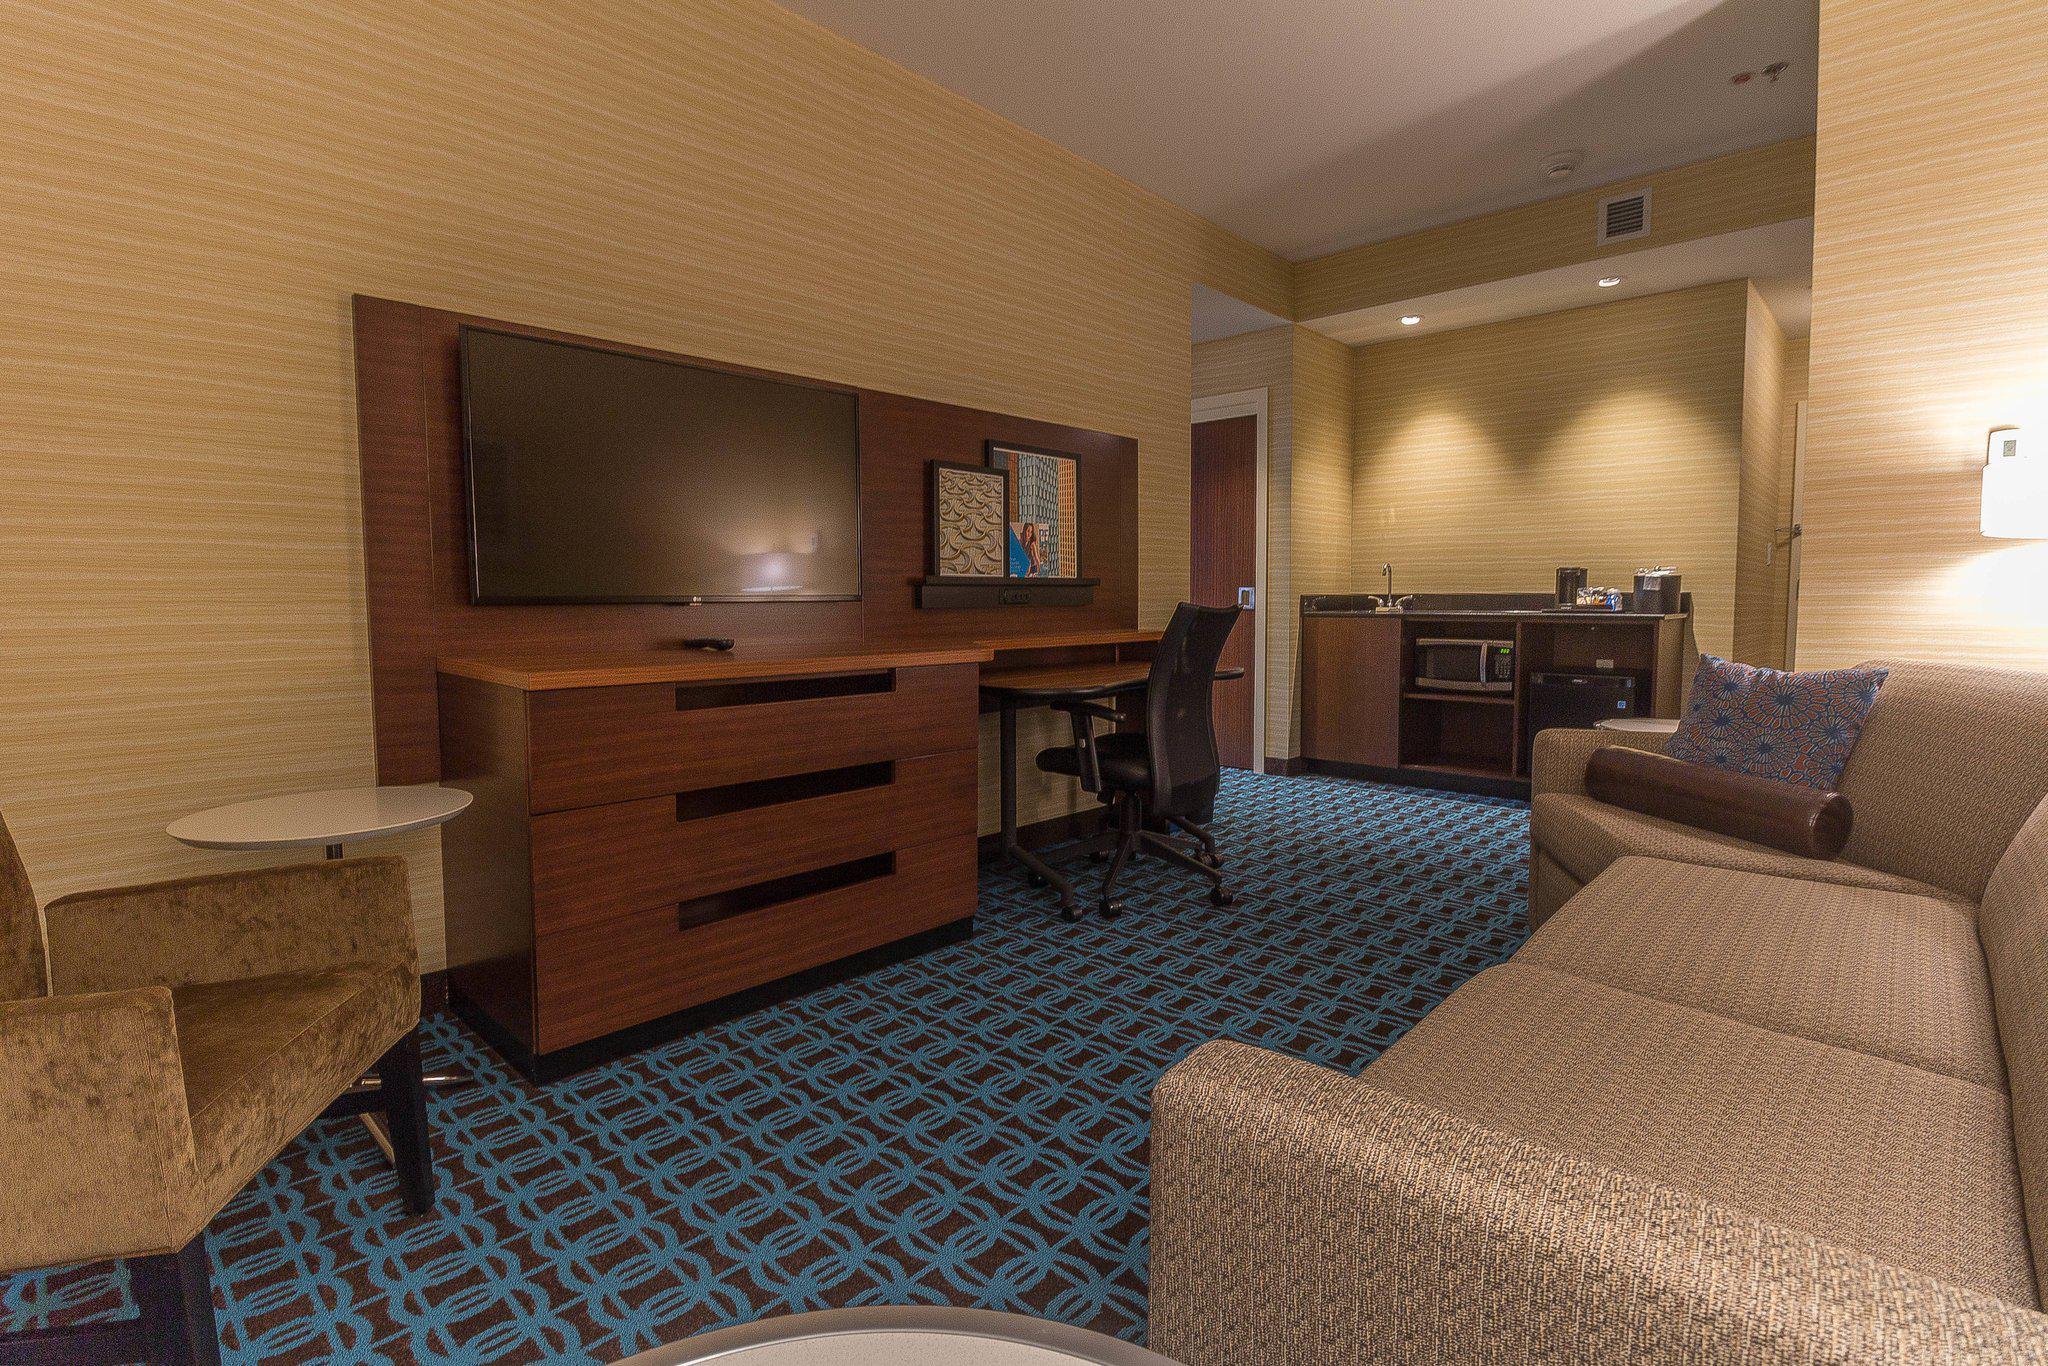 Fairfield Inn & Suites by Marriott Regina in Regina